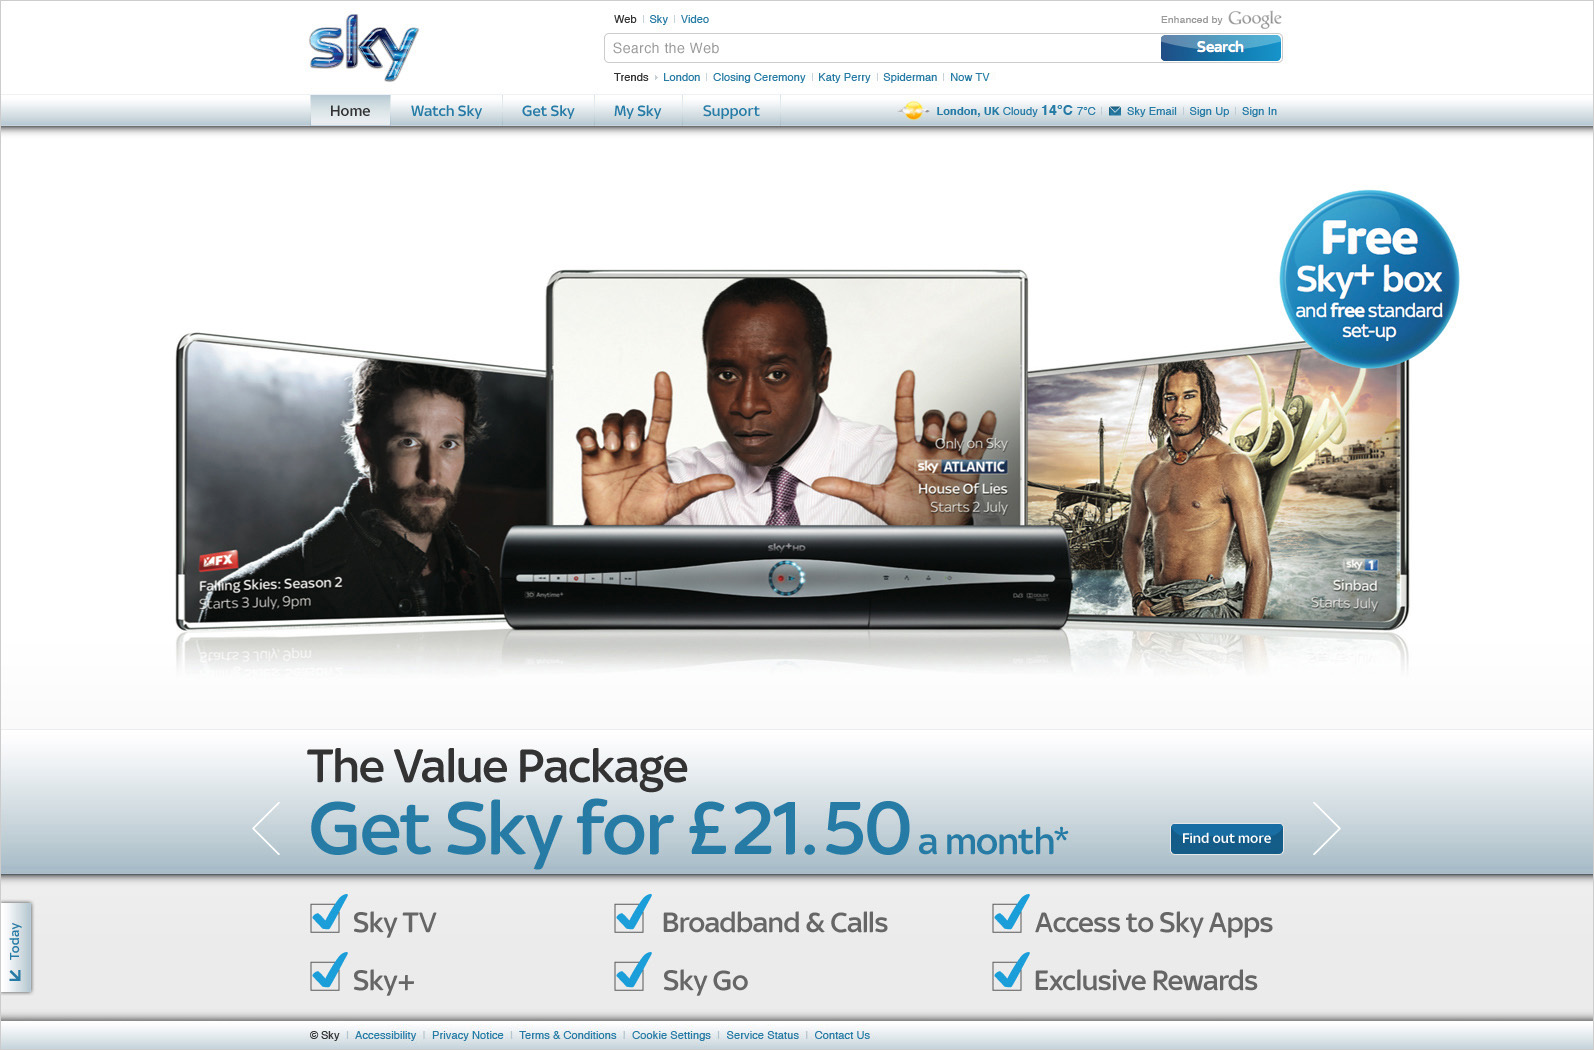 Sky_Homepage_11SkyOffer_2.jpg